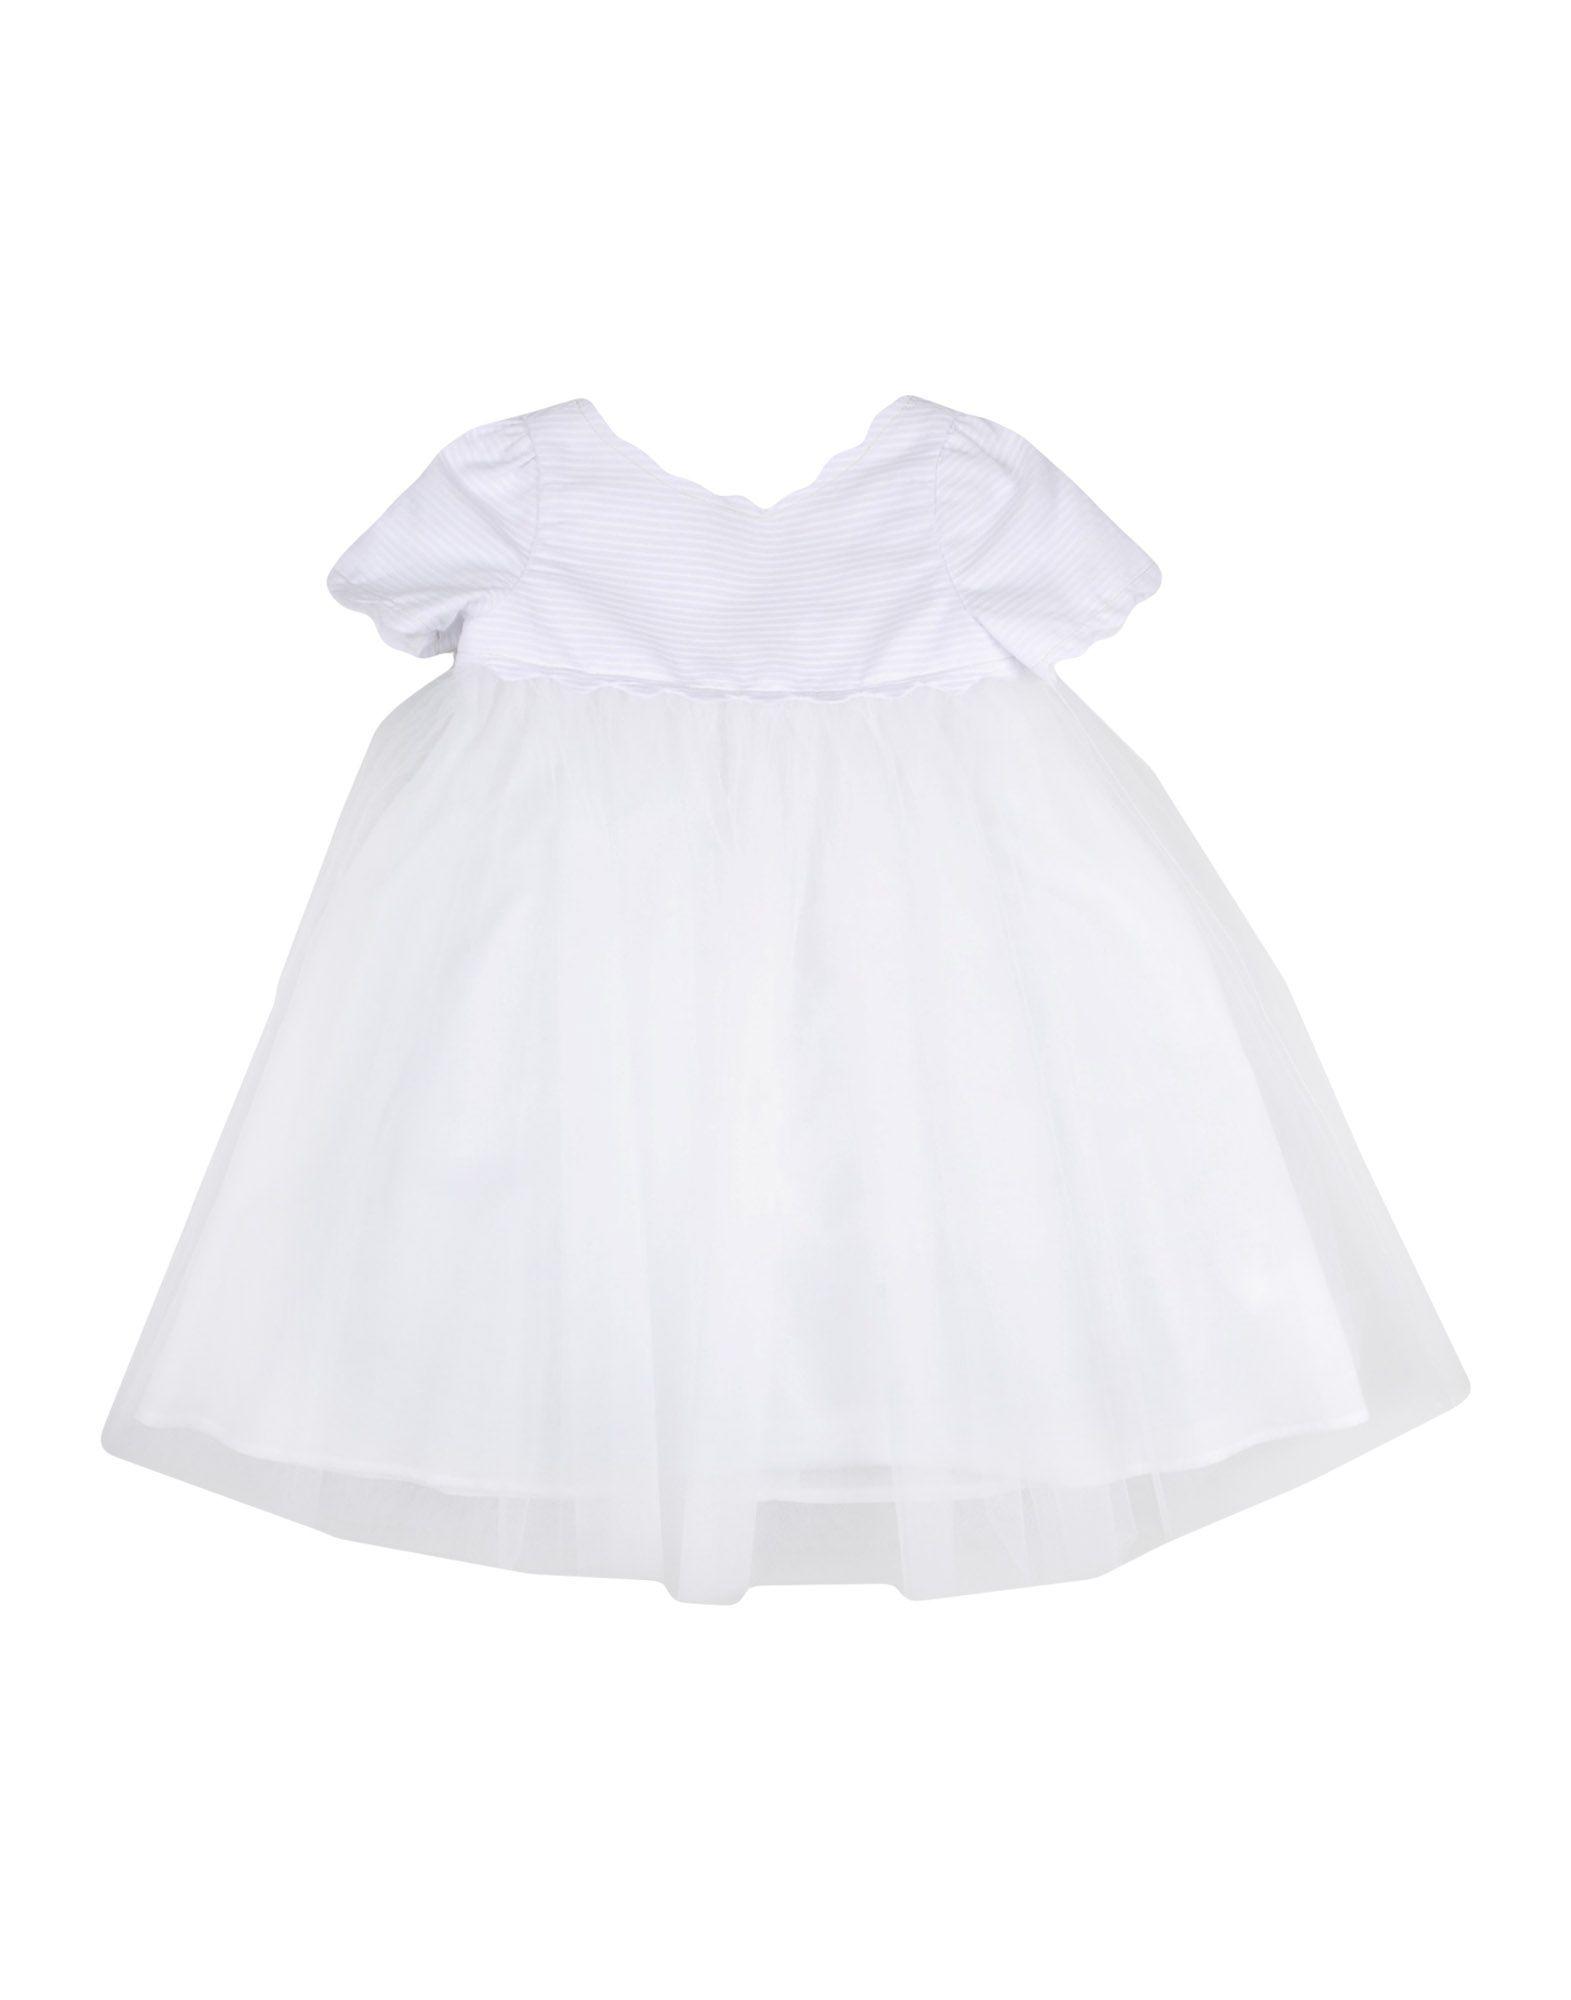 LILI GAUFRETTE Платье lili gaufrette бикини